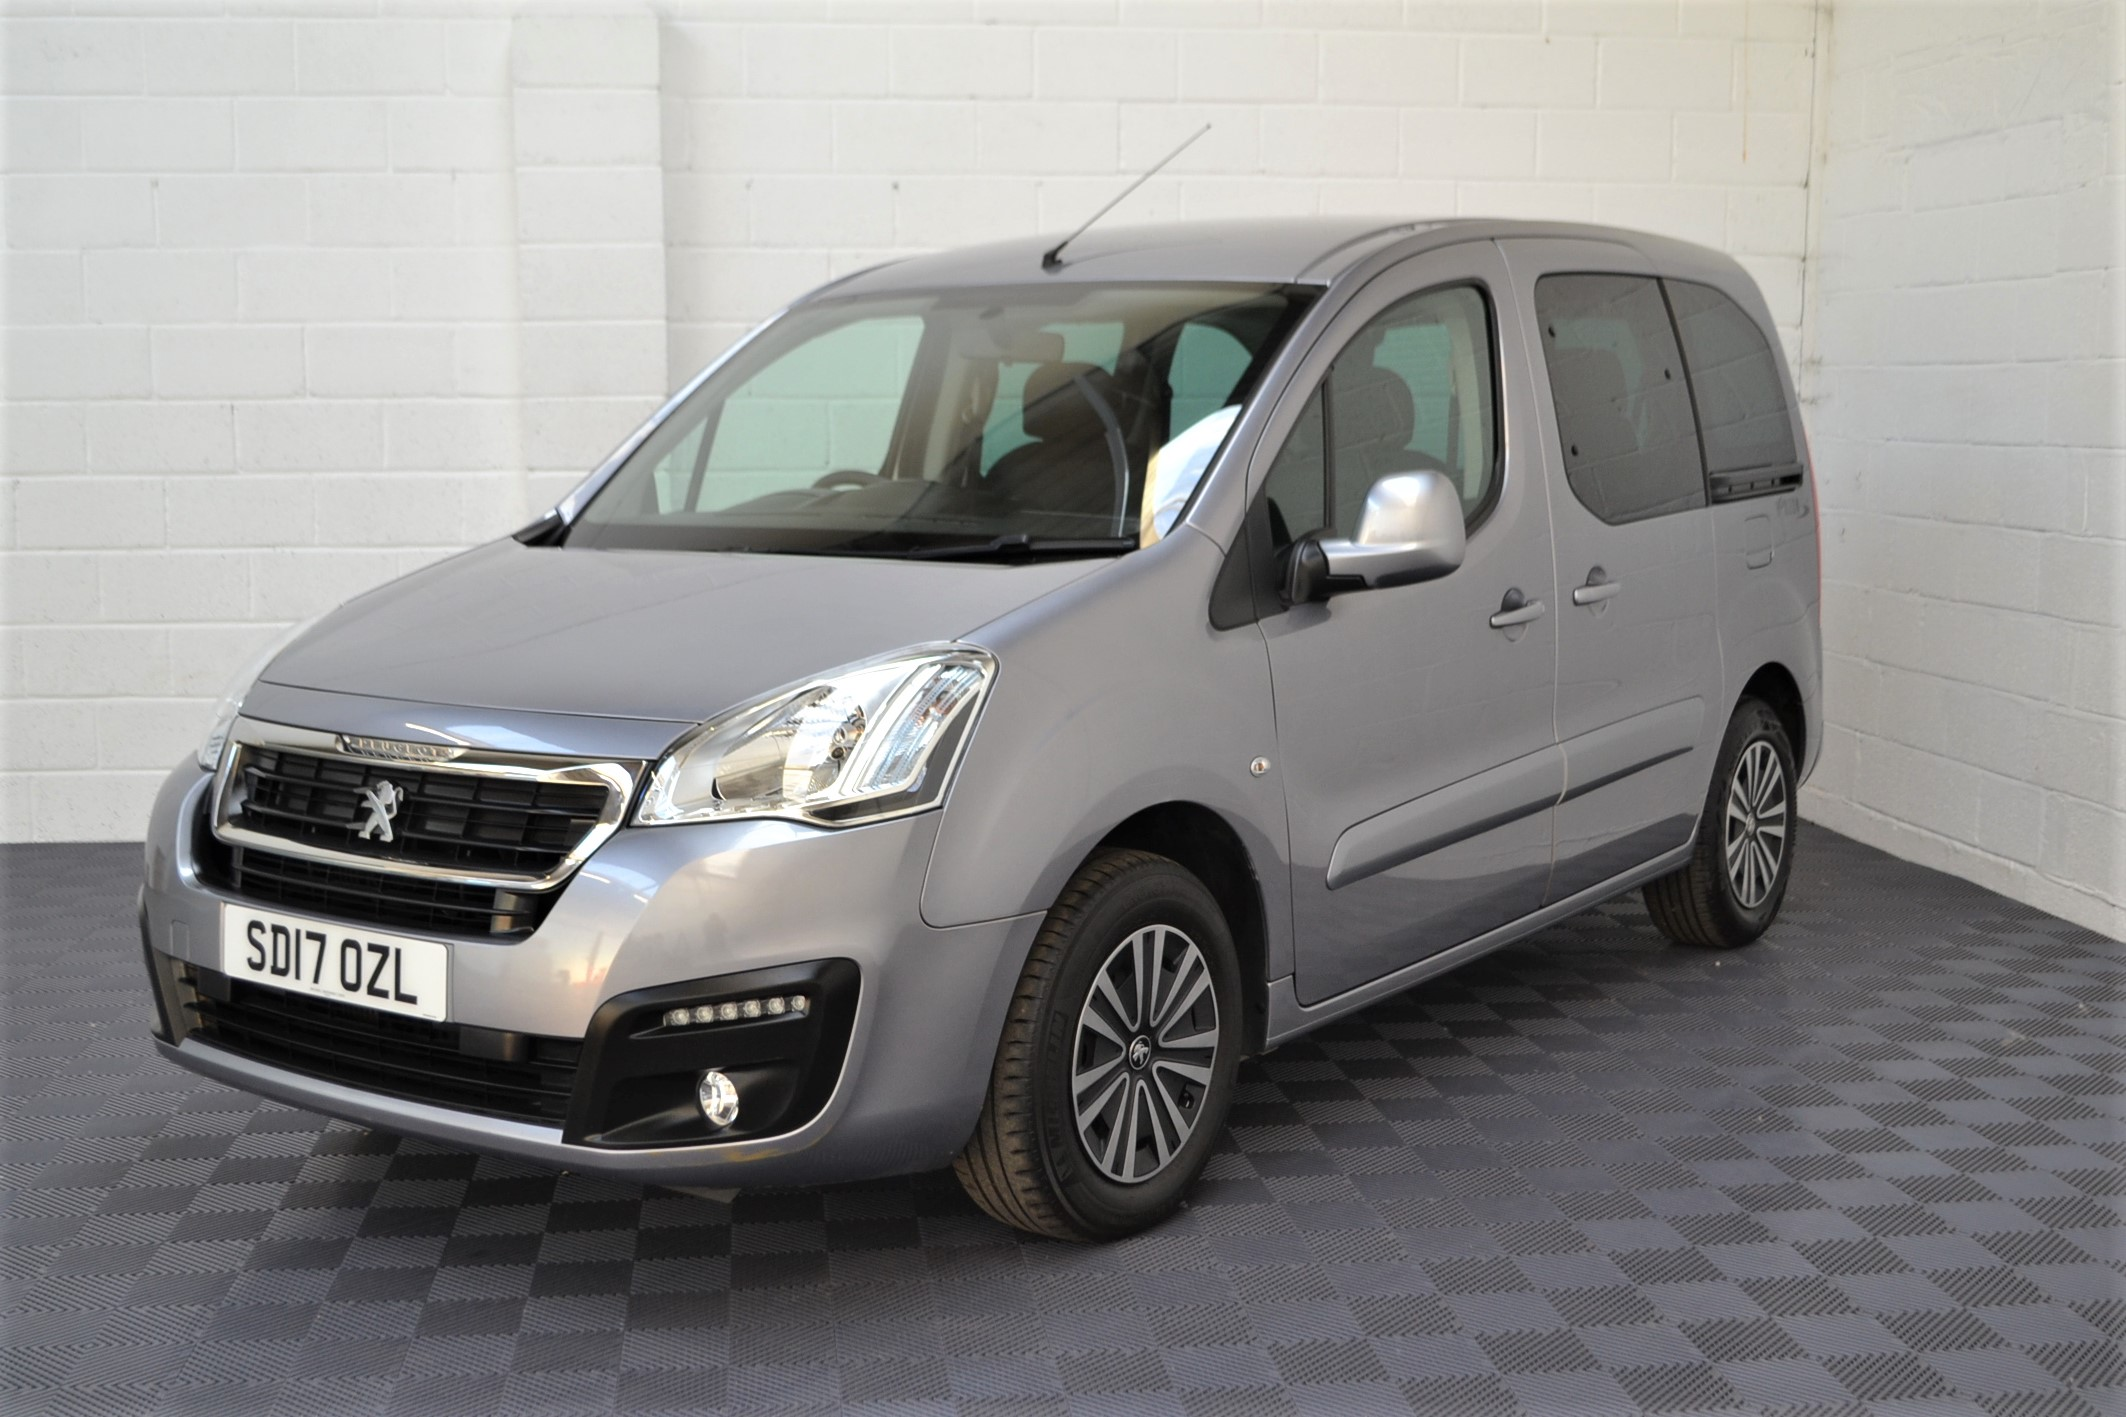 WAV Cars For Sale Bristol Wheelchair Accessible Vehicles Used For Sale Somerset Devon Dorset Bath Peugeot Partner SD17 OZL 22